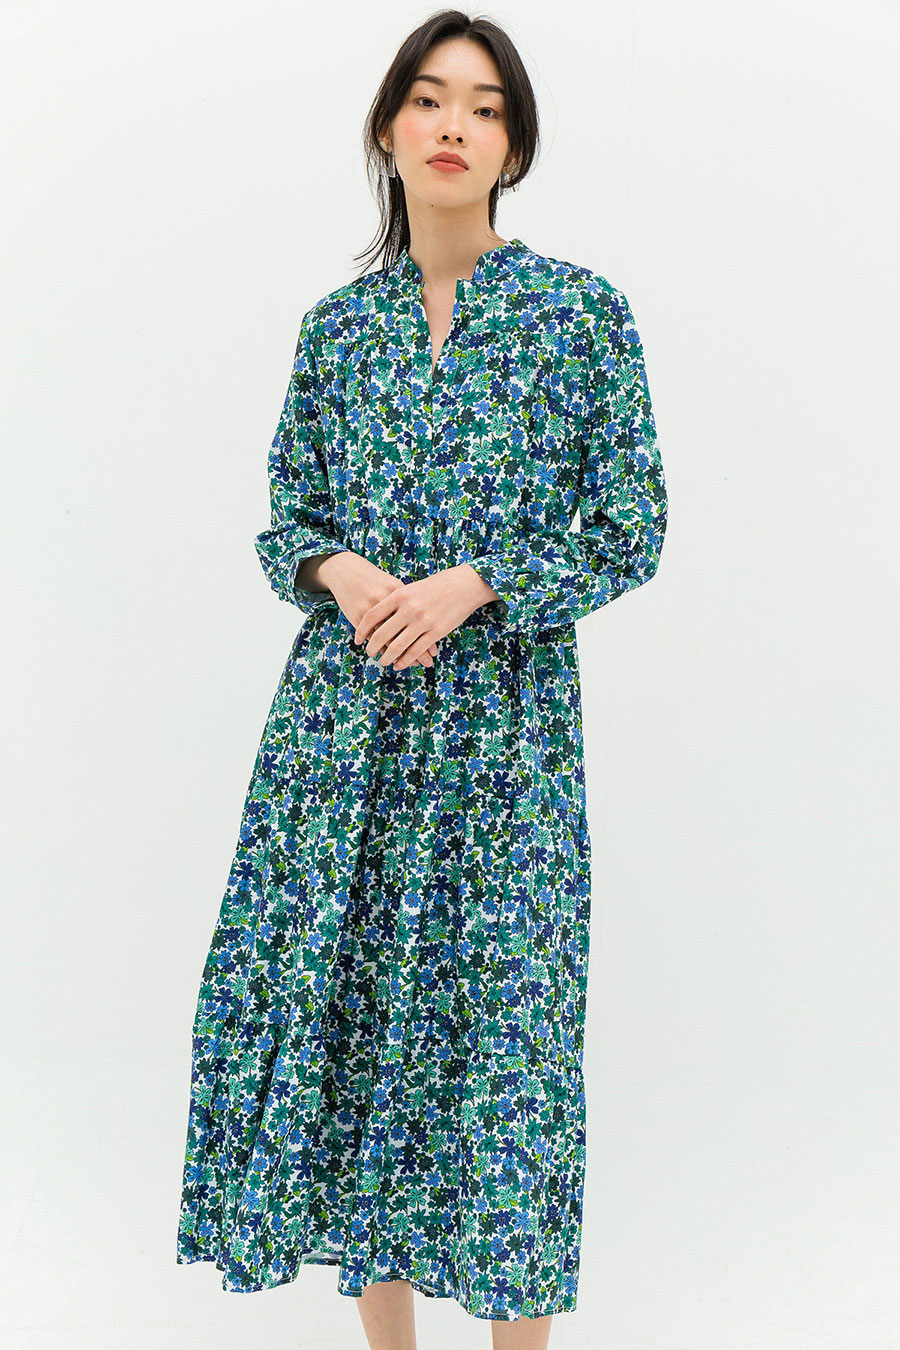 PASCAL DRESS - IGUANA GREEN